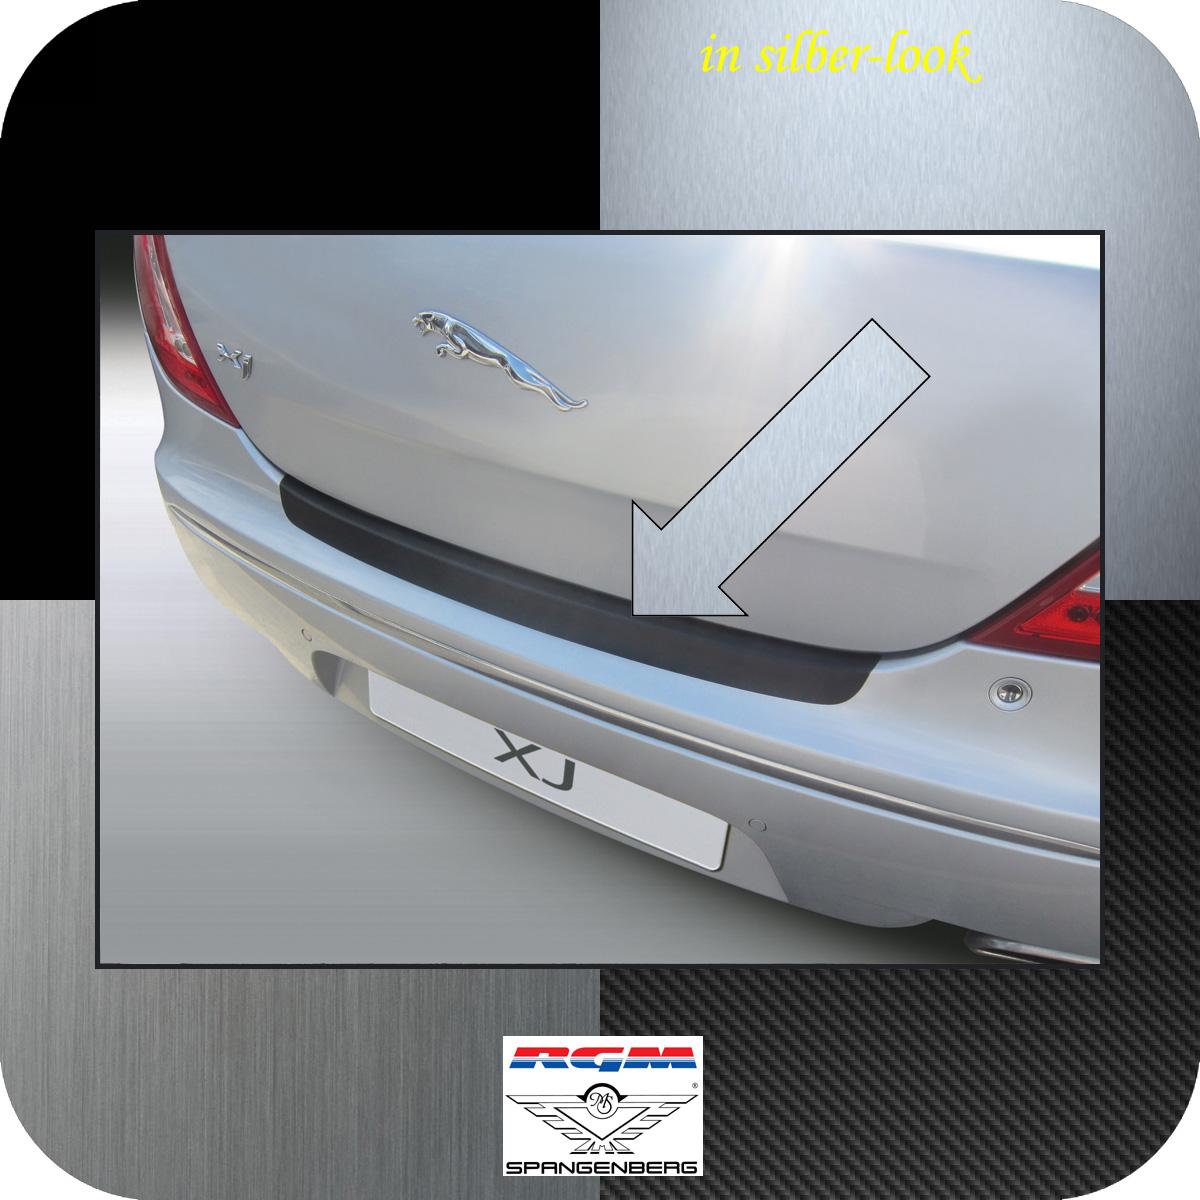 Ladekantenschutz Silber-Look Jaguar XJ Limousine 4-Türer ab Bj 2009- 3506954